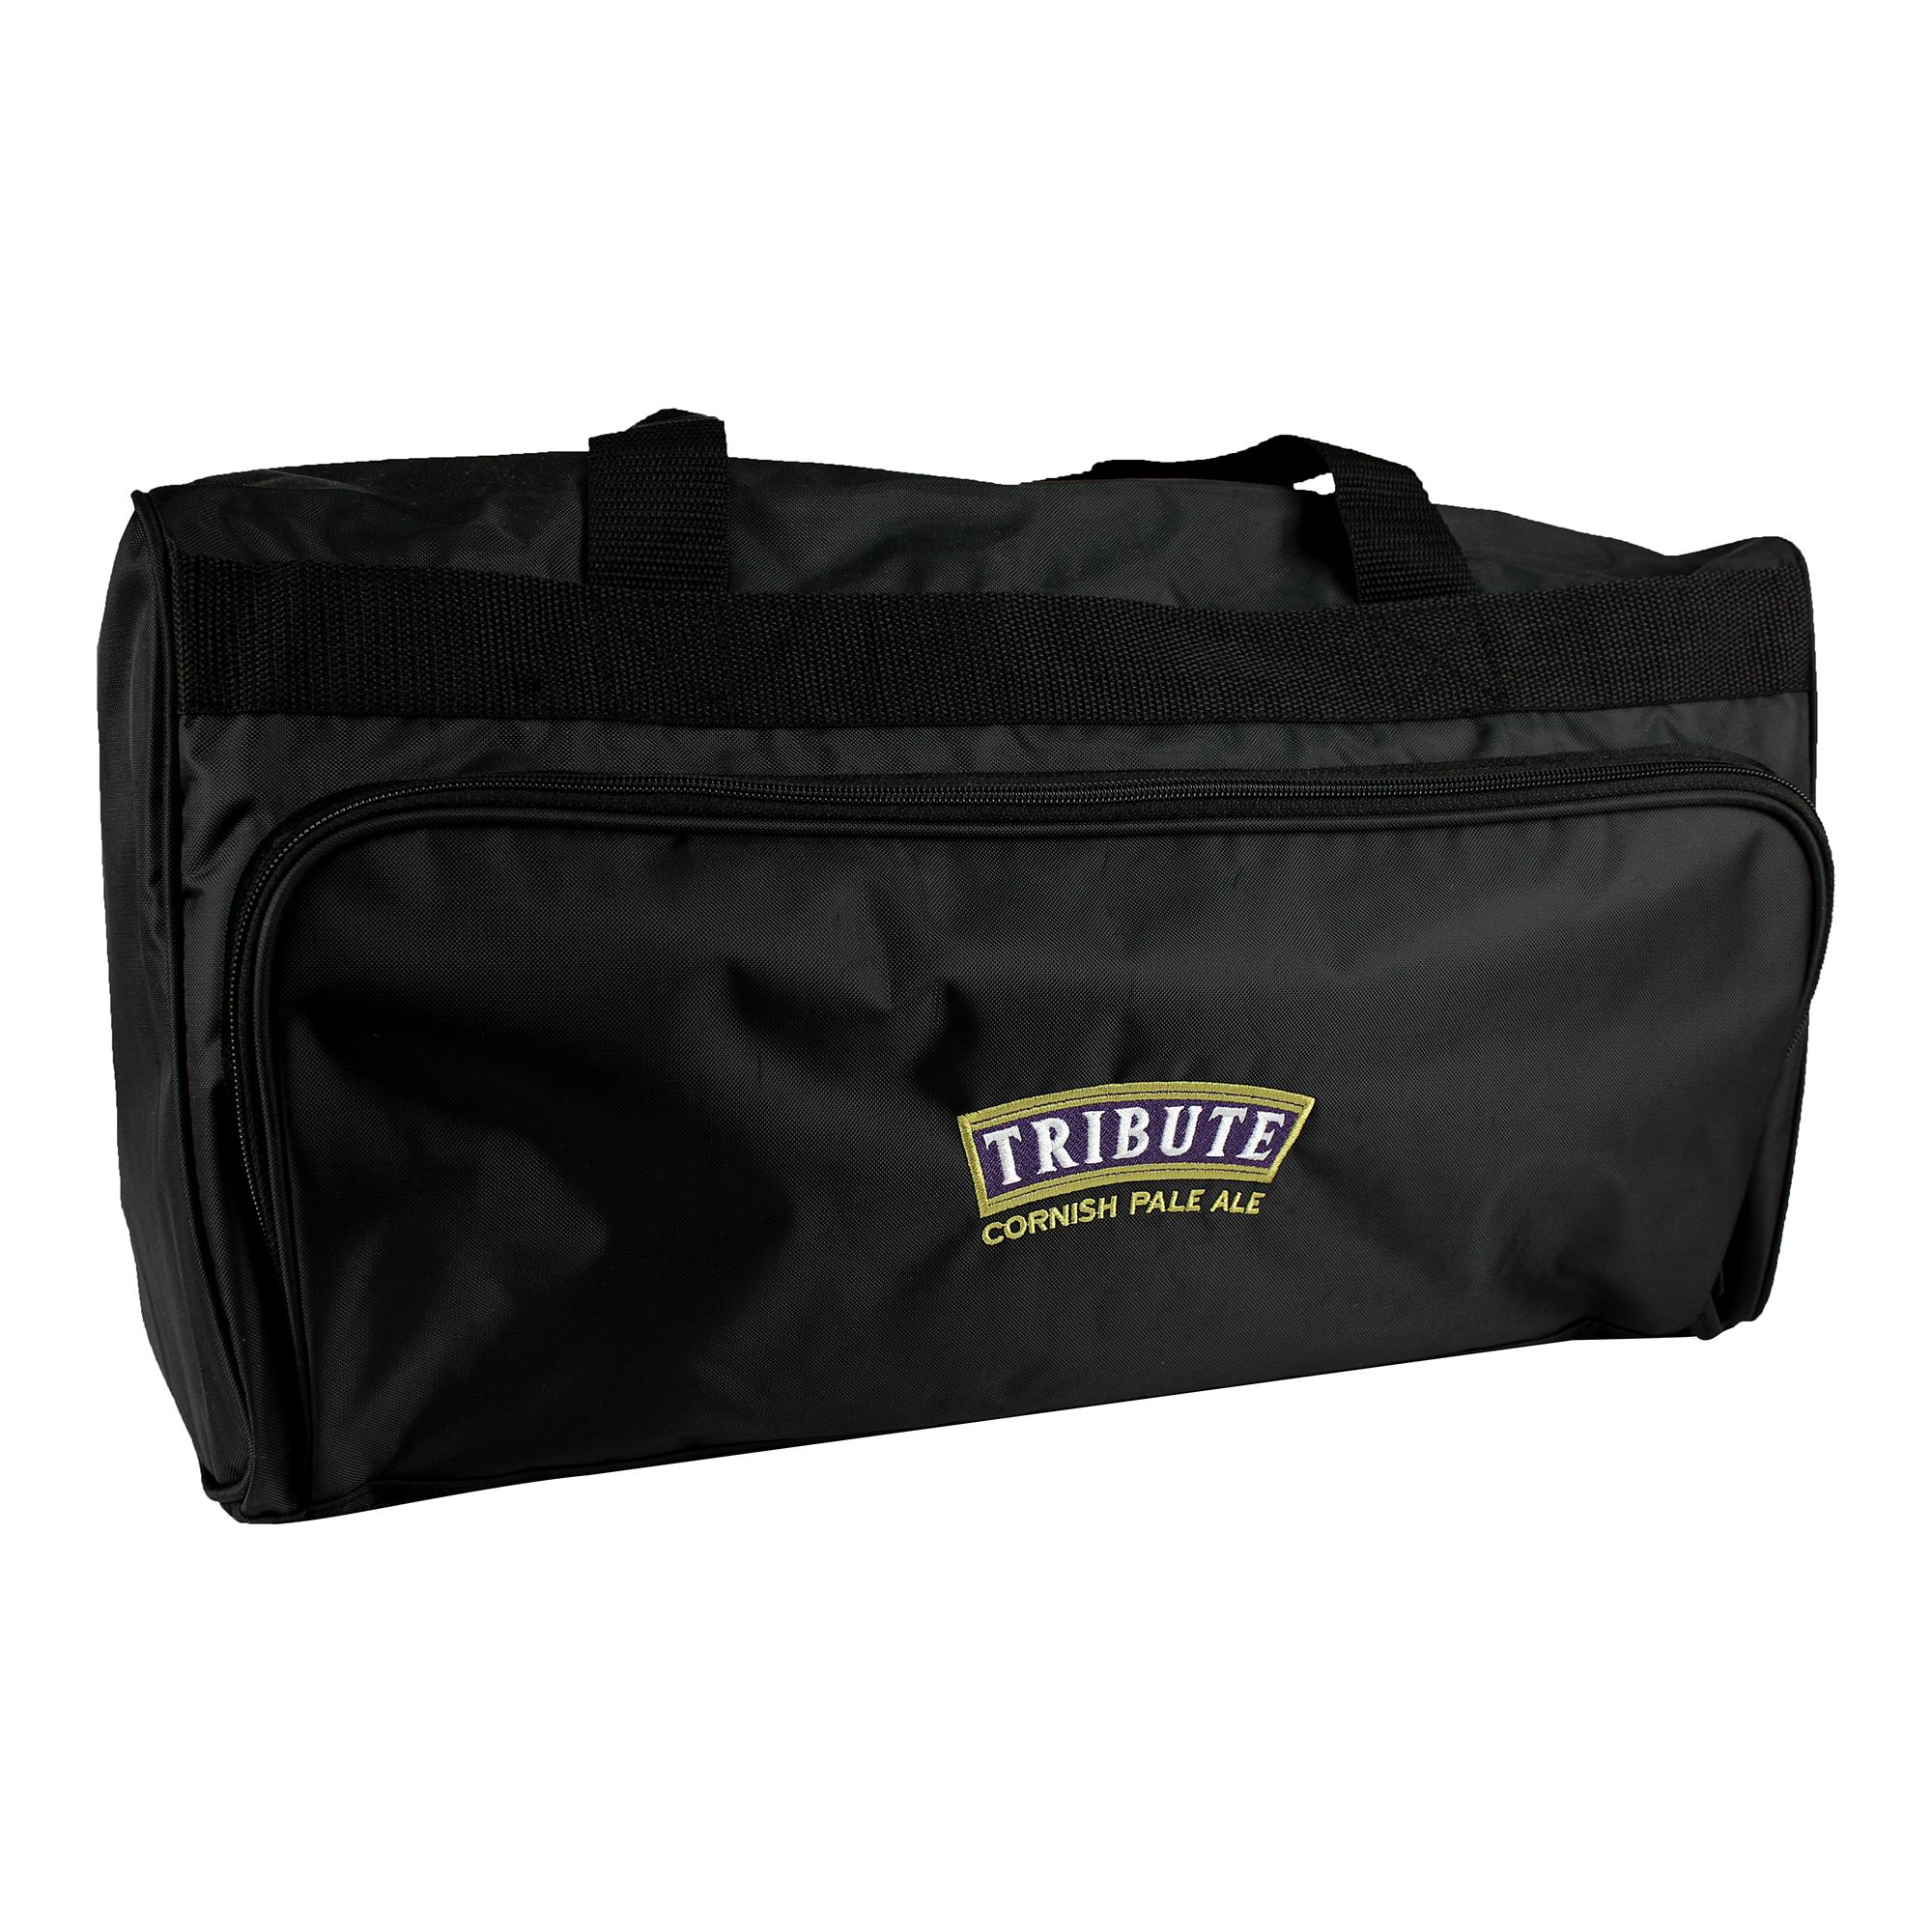 Tribute Sports Bag